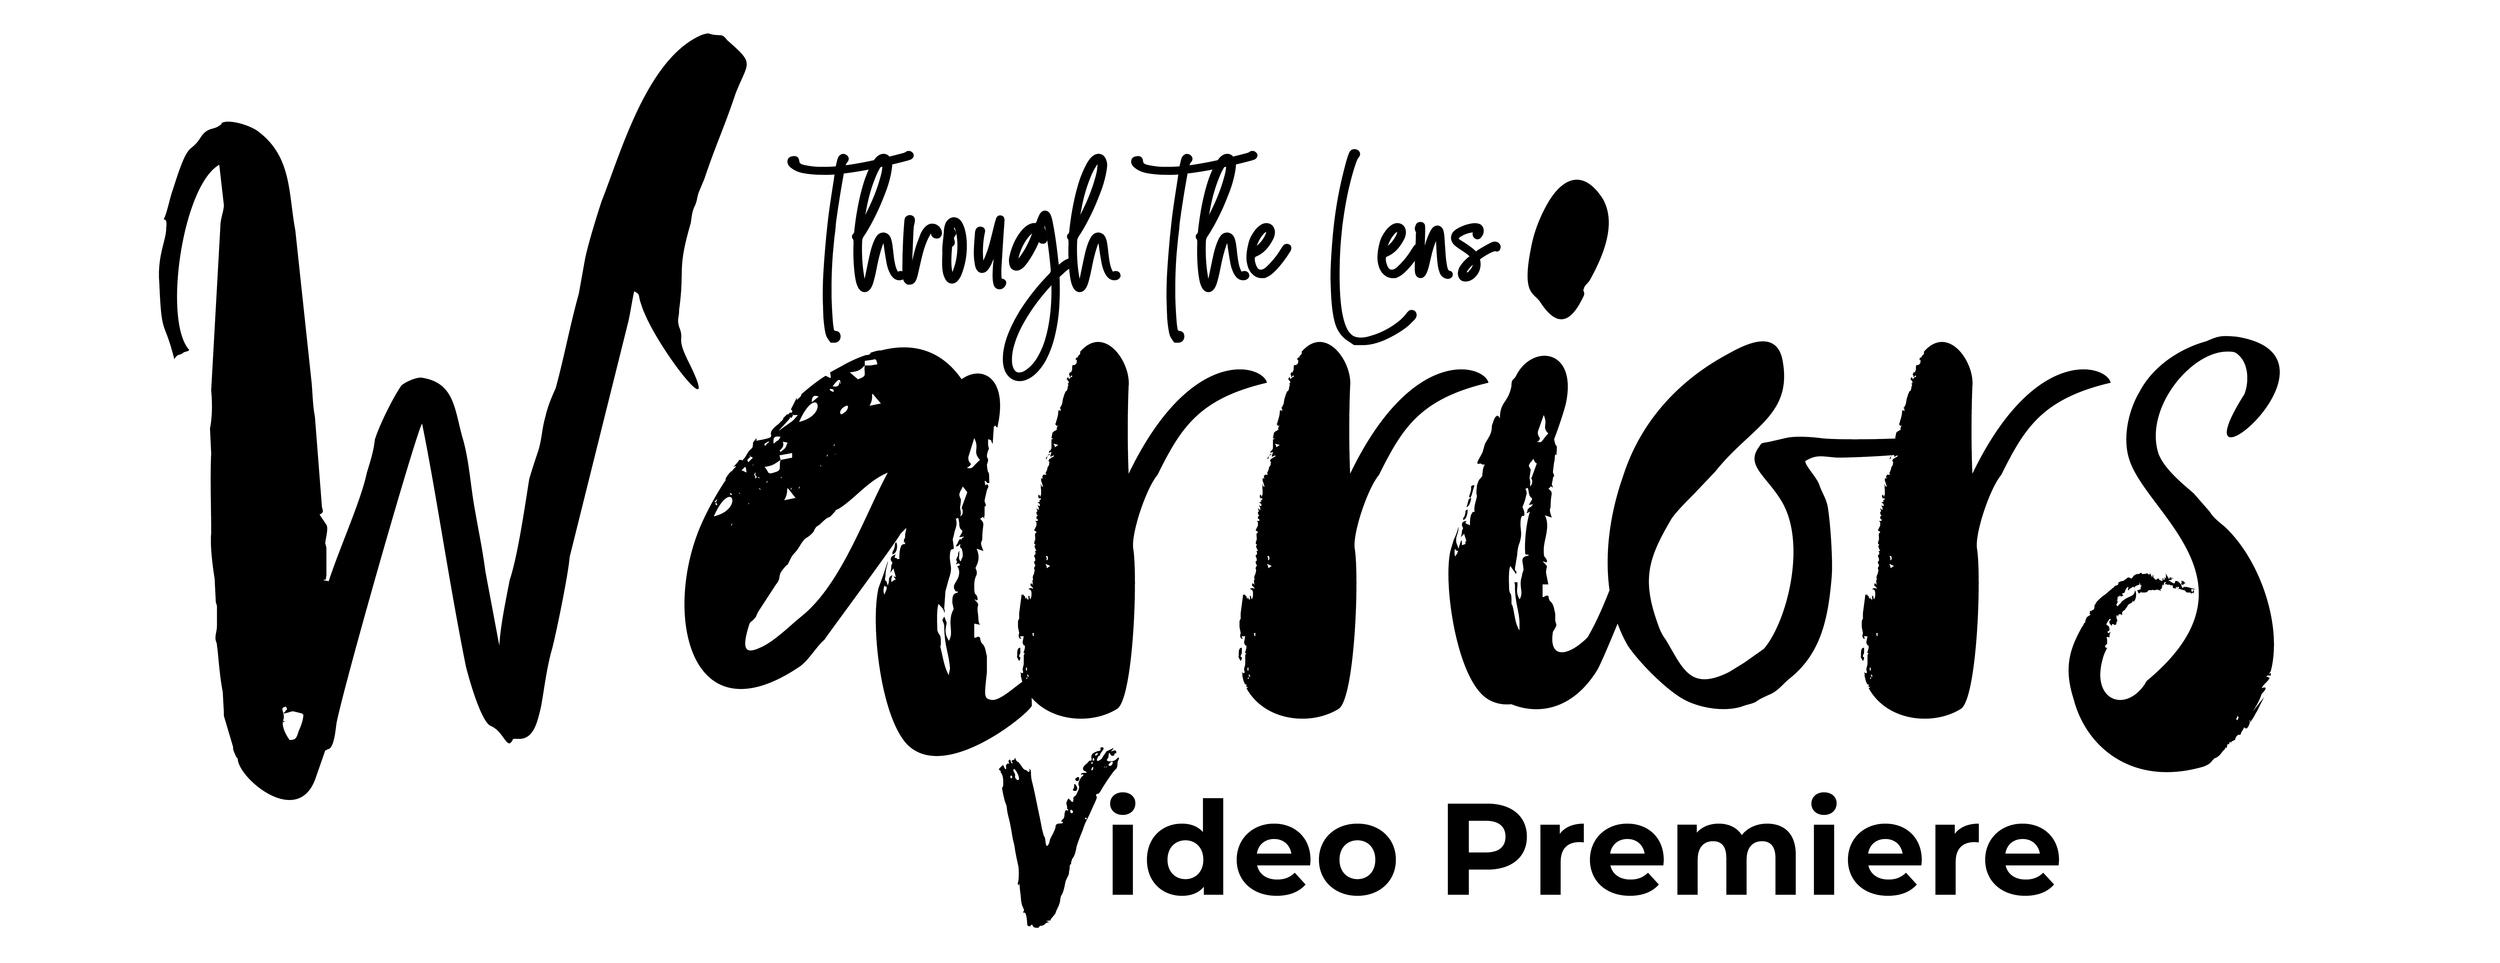 Warrior Video Premiere_SM_BLKonWHT.png